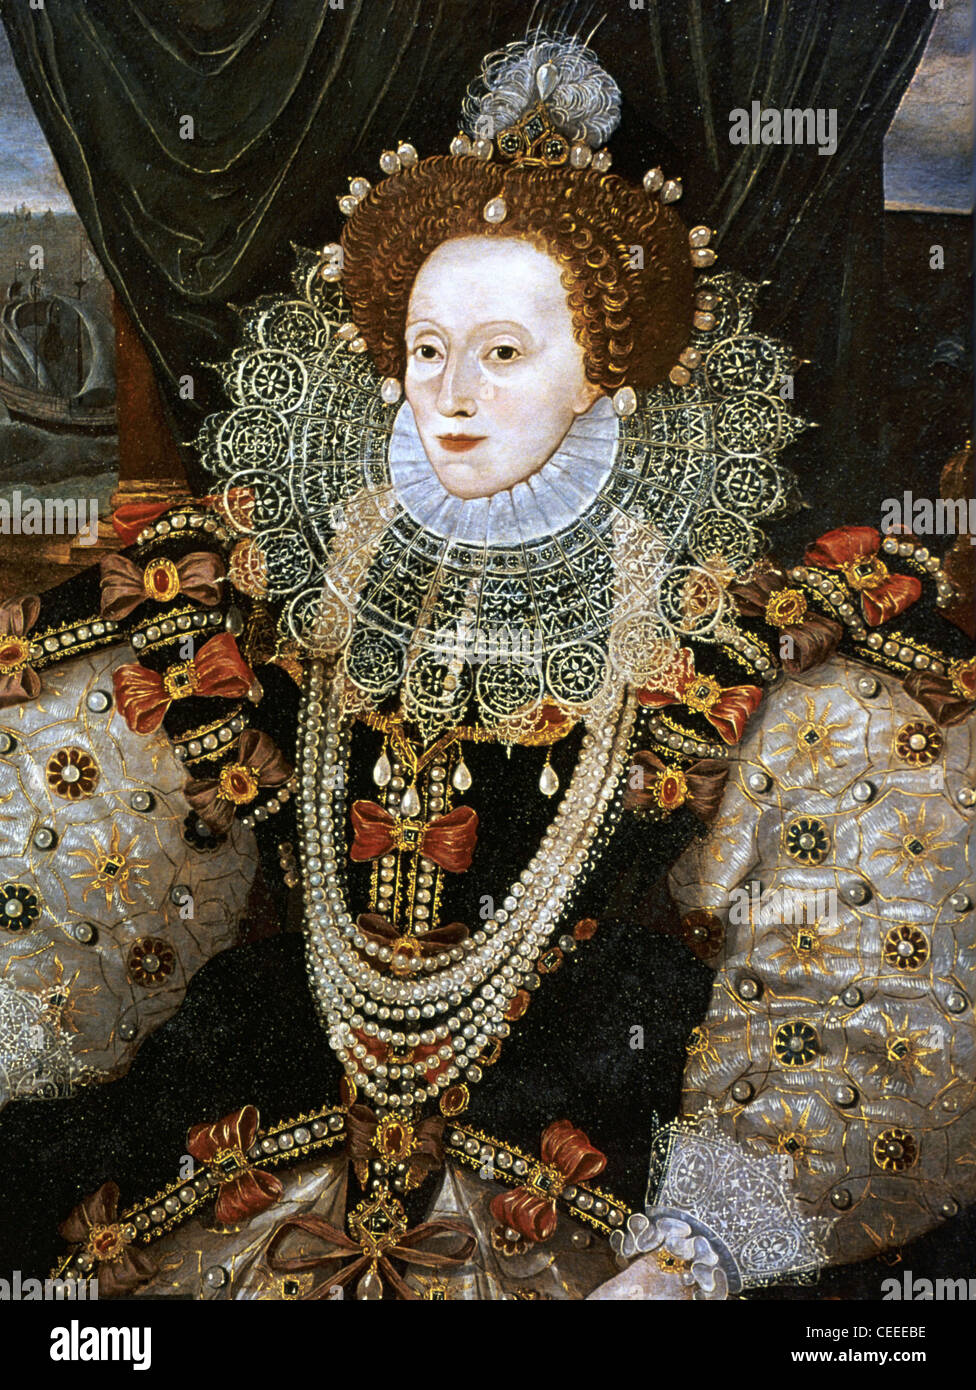 With Age elizabeth genius golden i queen virgin amusing